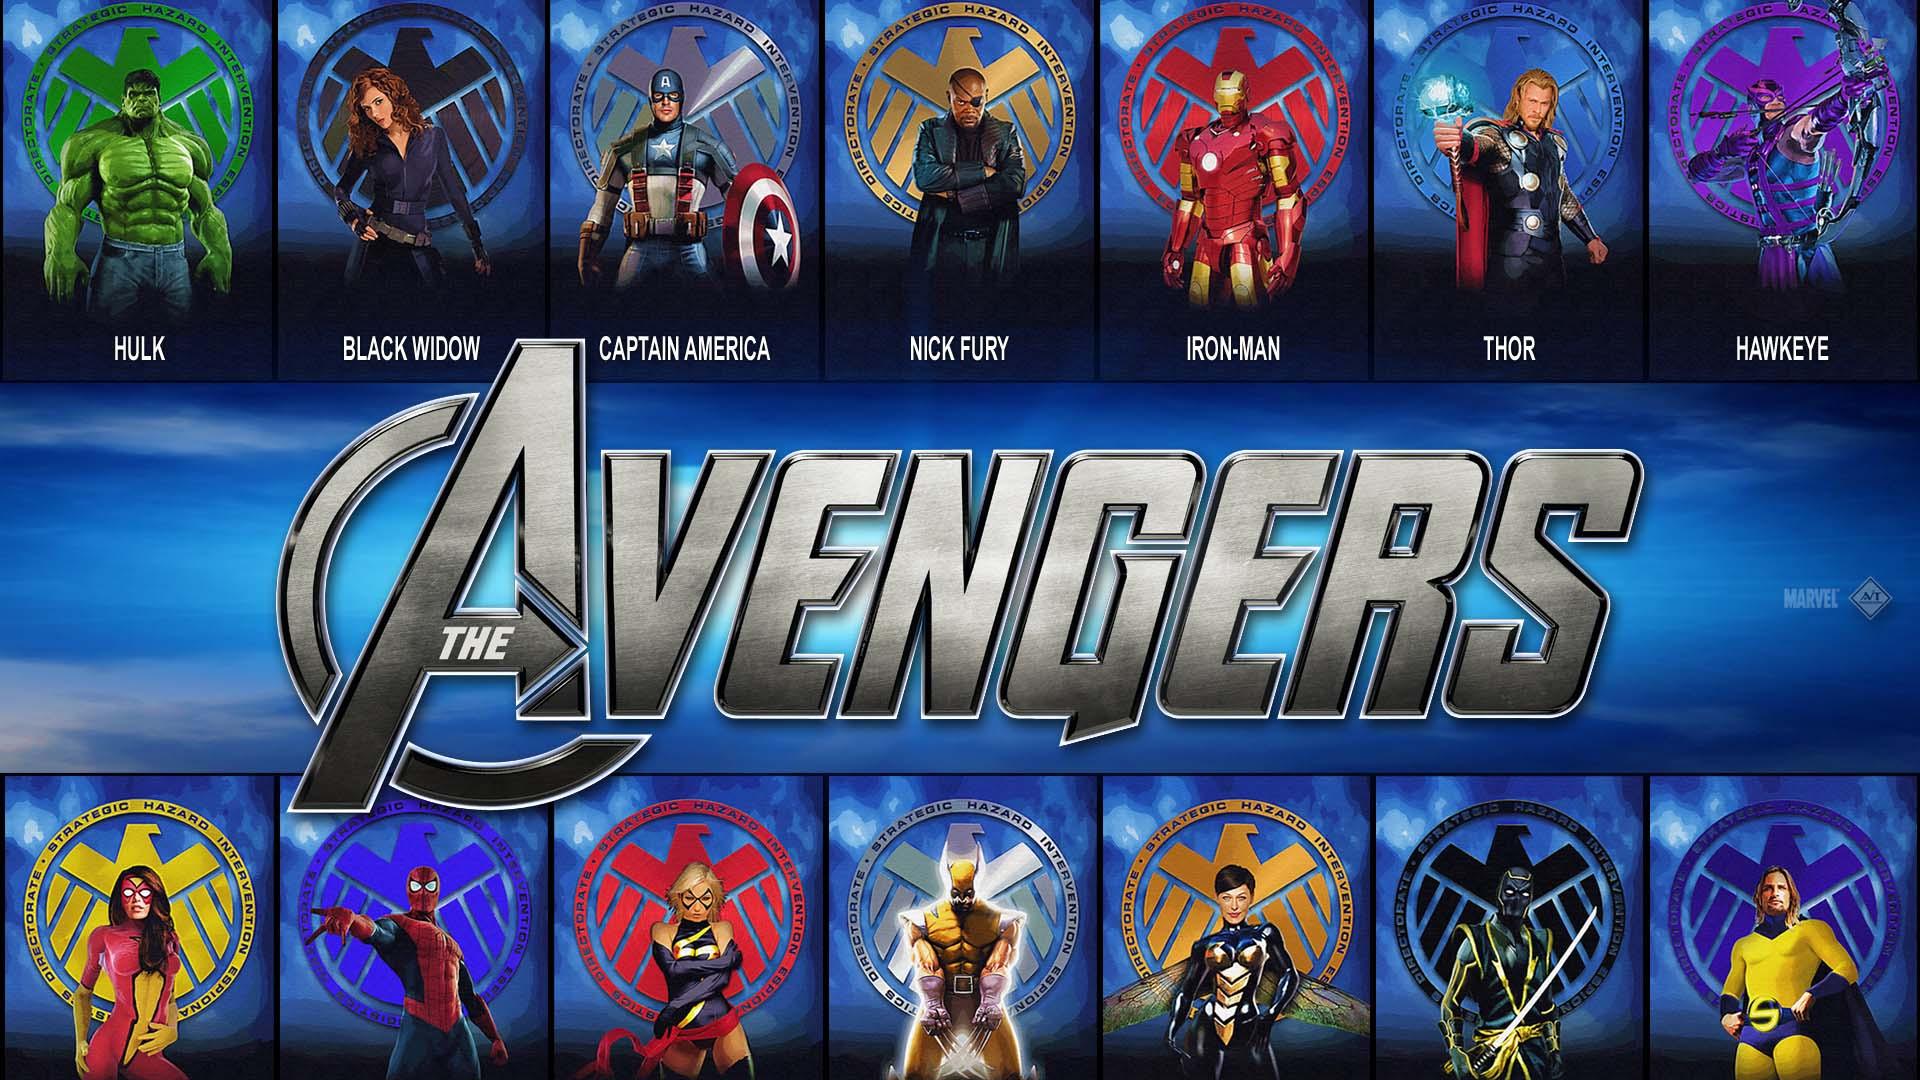 Hd Avengers Desktop Wallpaper Hd Wallpapers 1920x1080